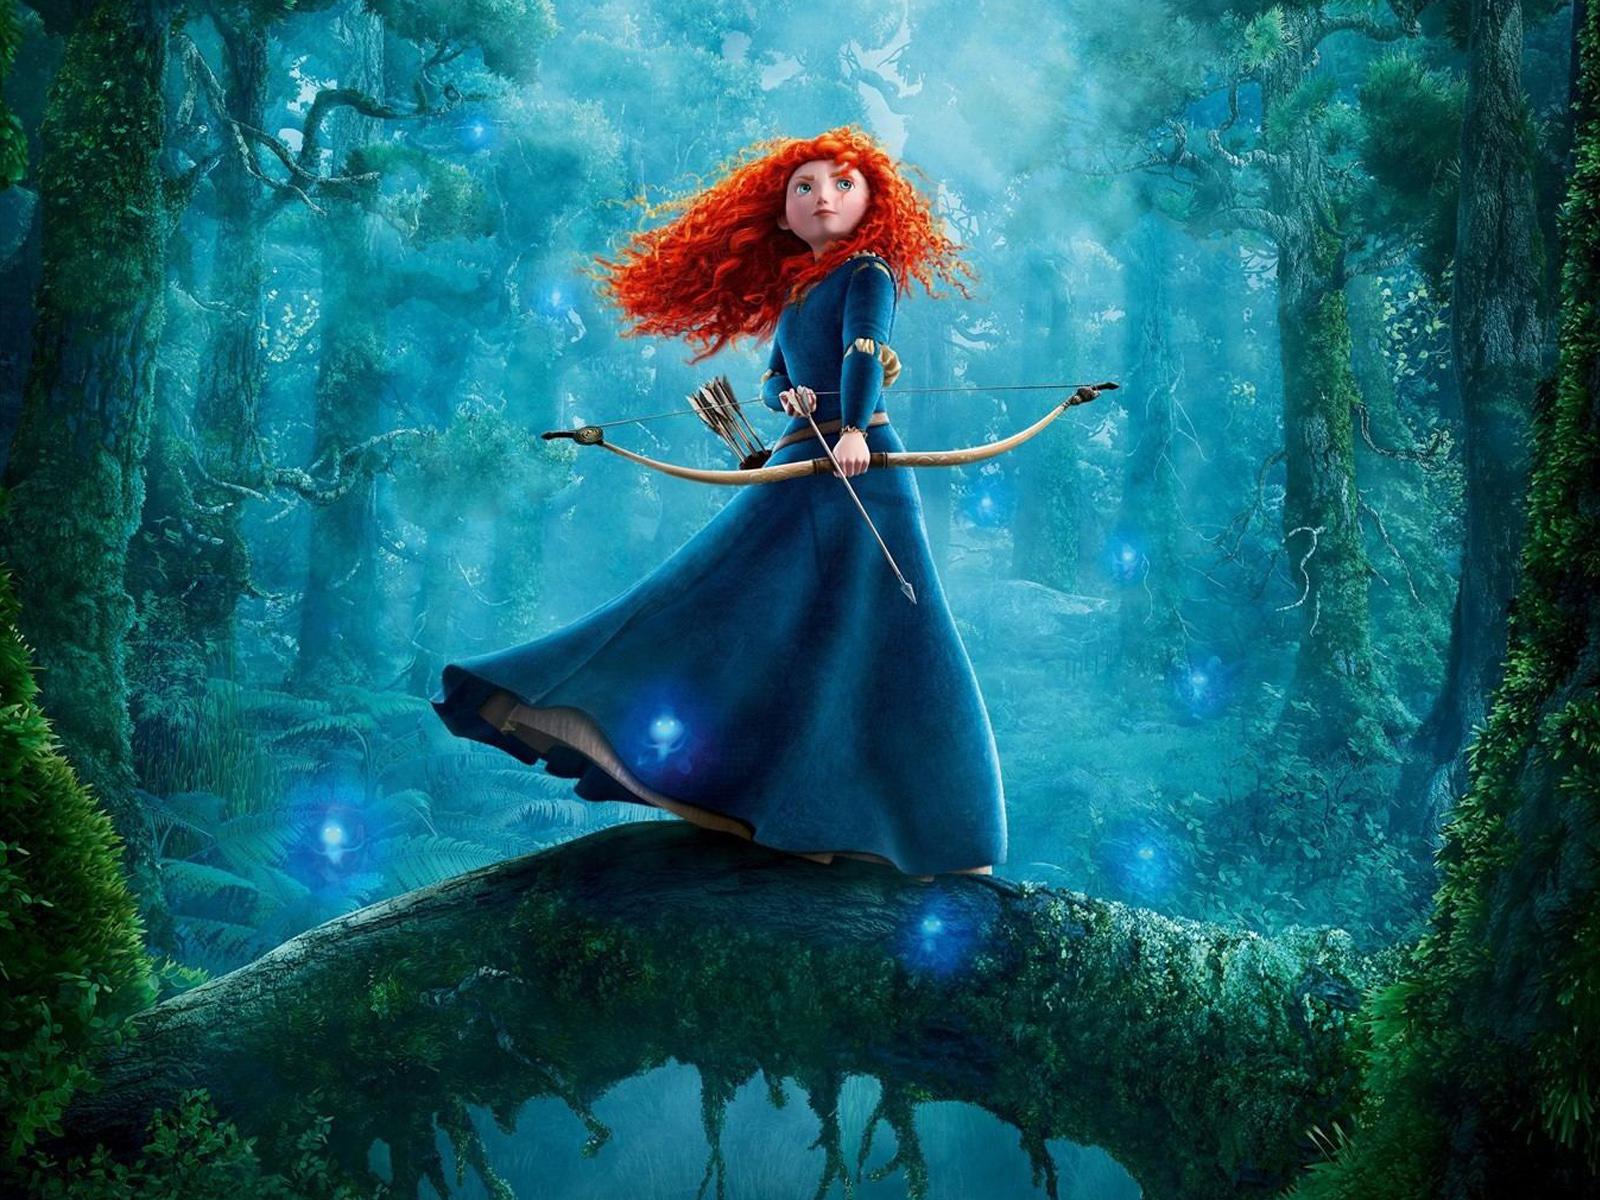 Merida Brave, Disney